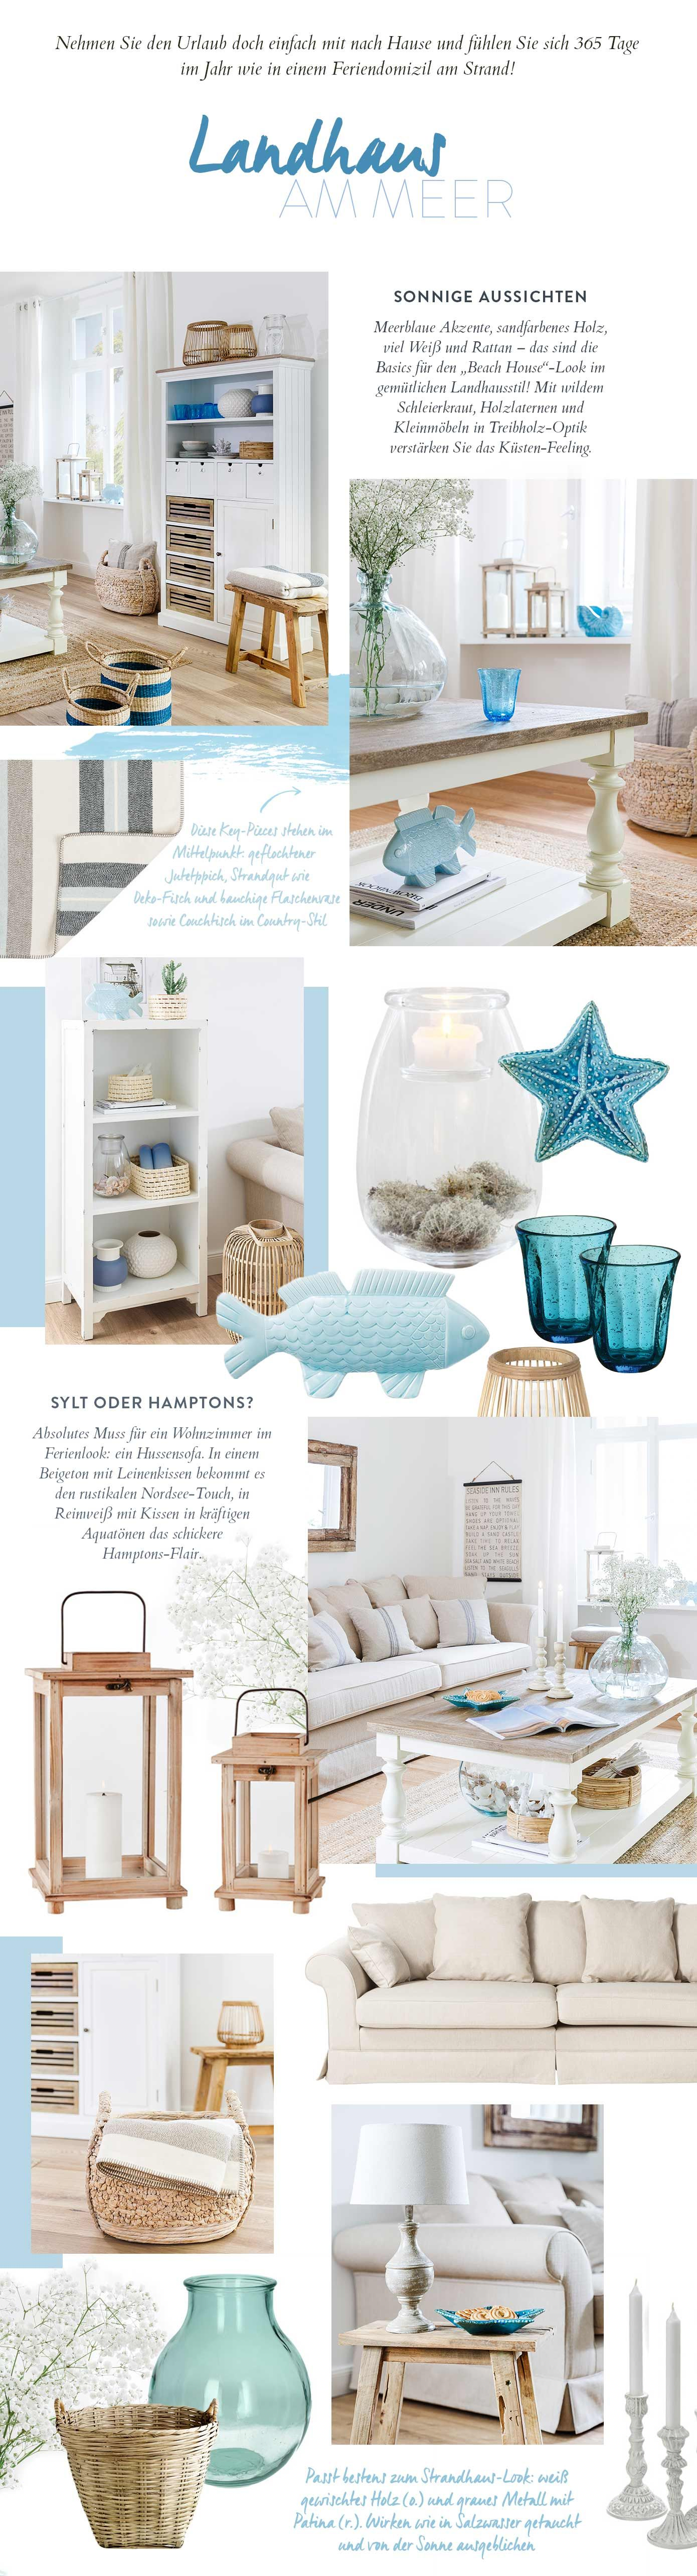 Looks Banner | Livingroom | Pinterest | Maritim, Strandhäuser und ...